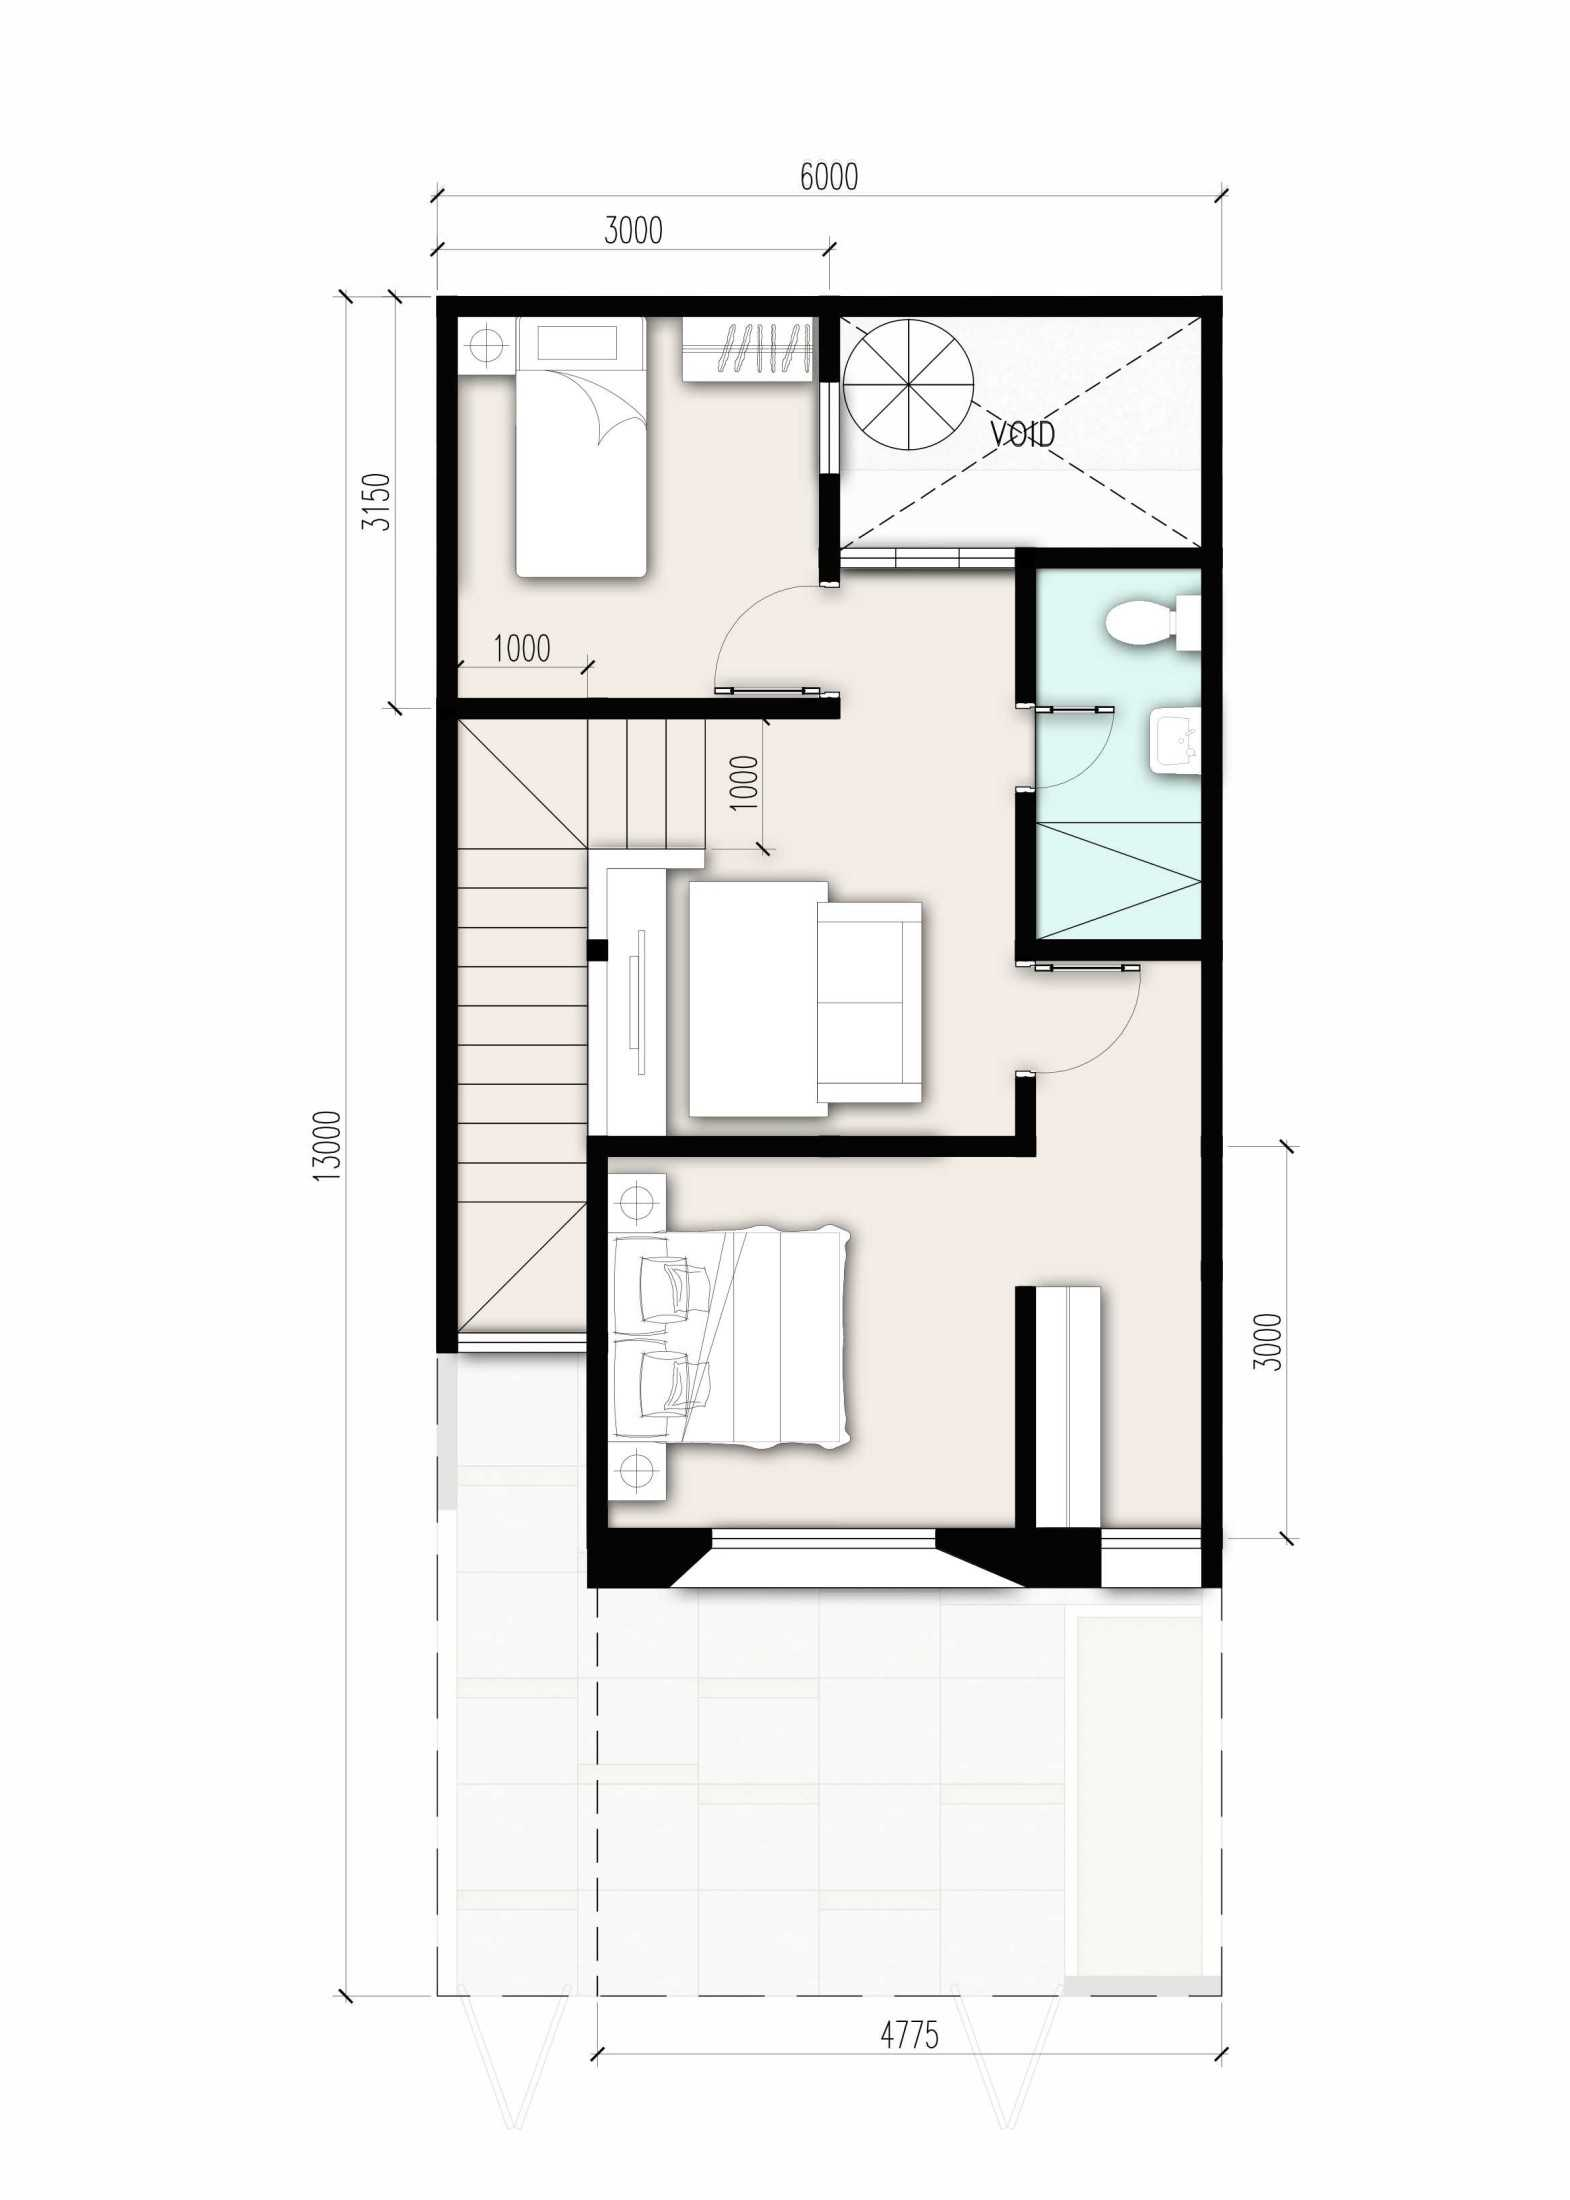 Zigzag Architecture Studio D House - Cibitung Cibitung, Bekasi, Jawa Barat, Indonesia Cibitung, Bekasi, Jawa Barat, Indonesia Zigzag-Architecture-Studio-D-House-Cibitung Kontemporer 56154